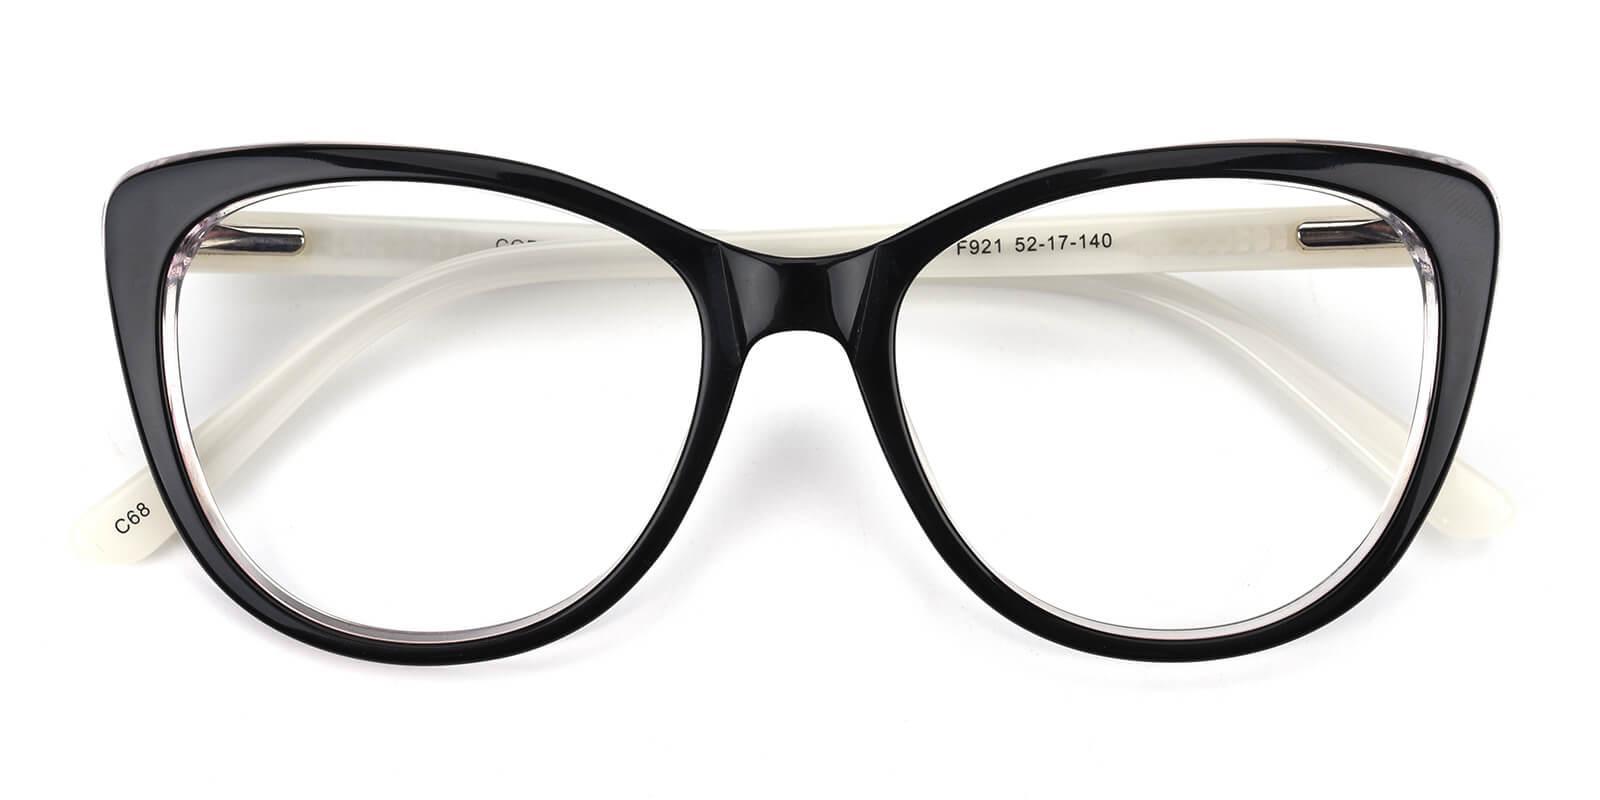 Secretly-White-Cat-Acetate-Eyeglasses-detail